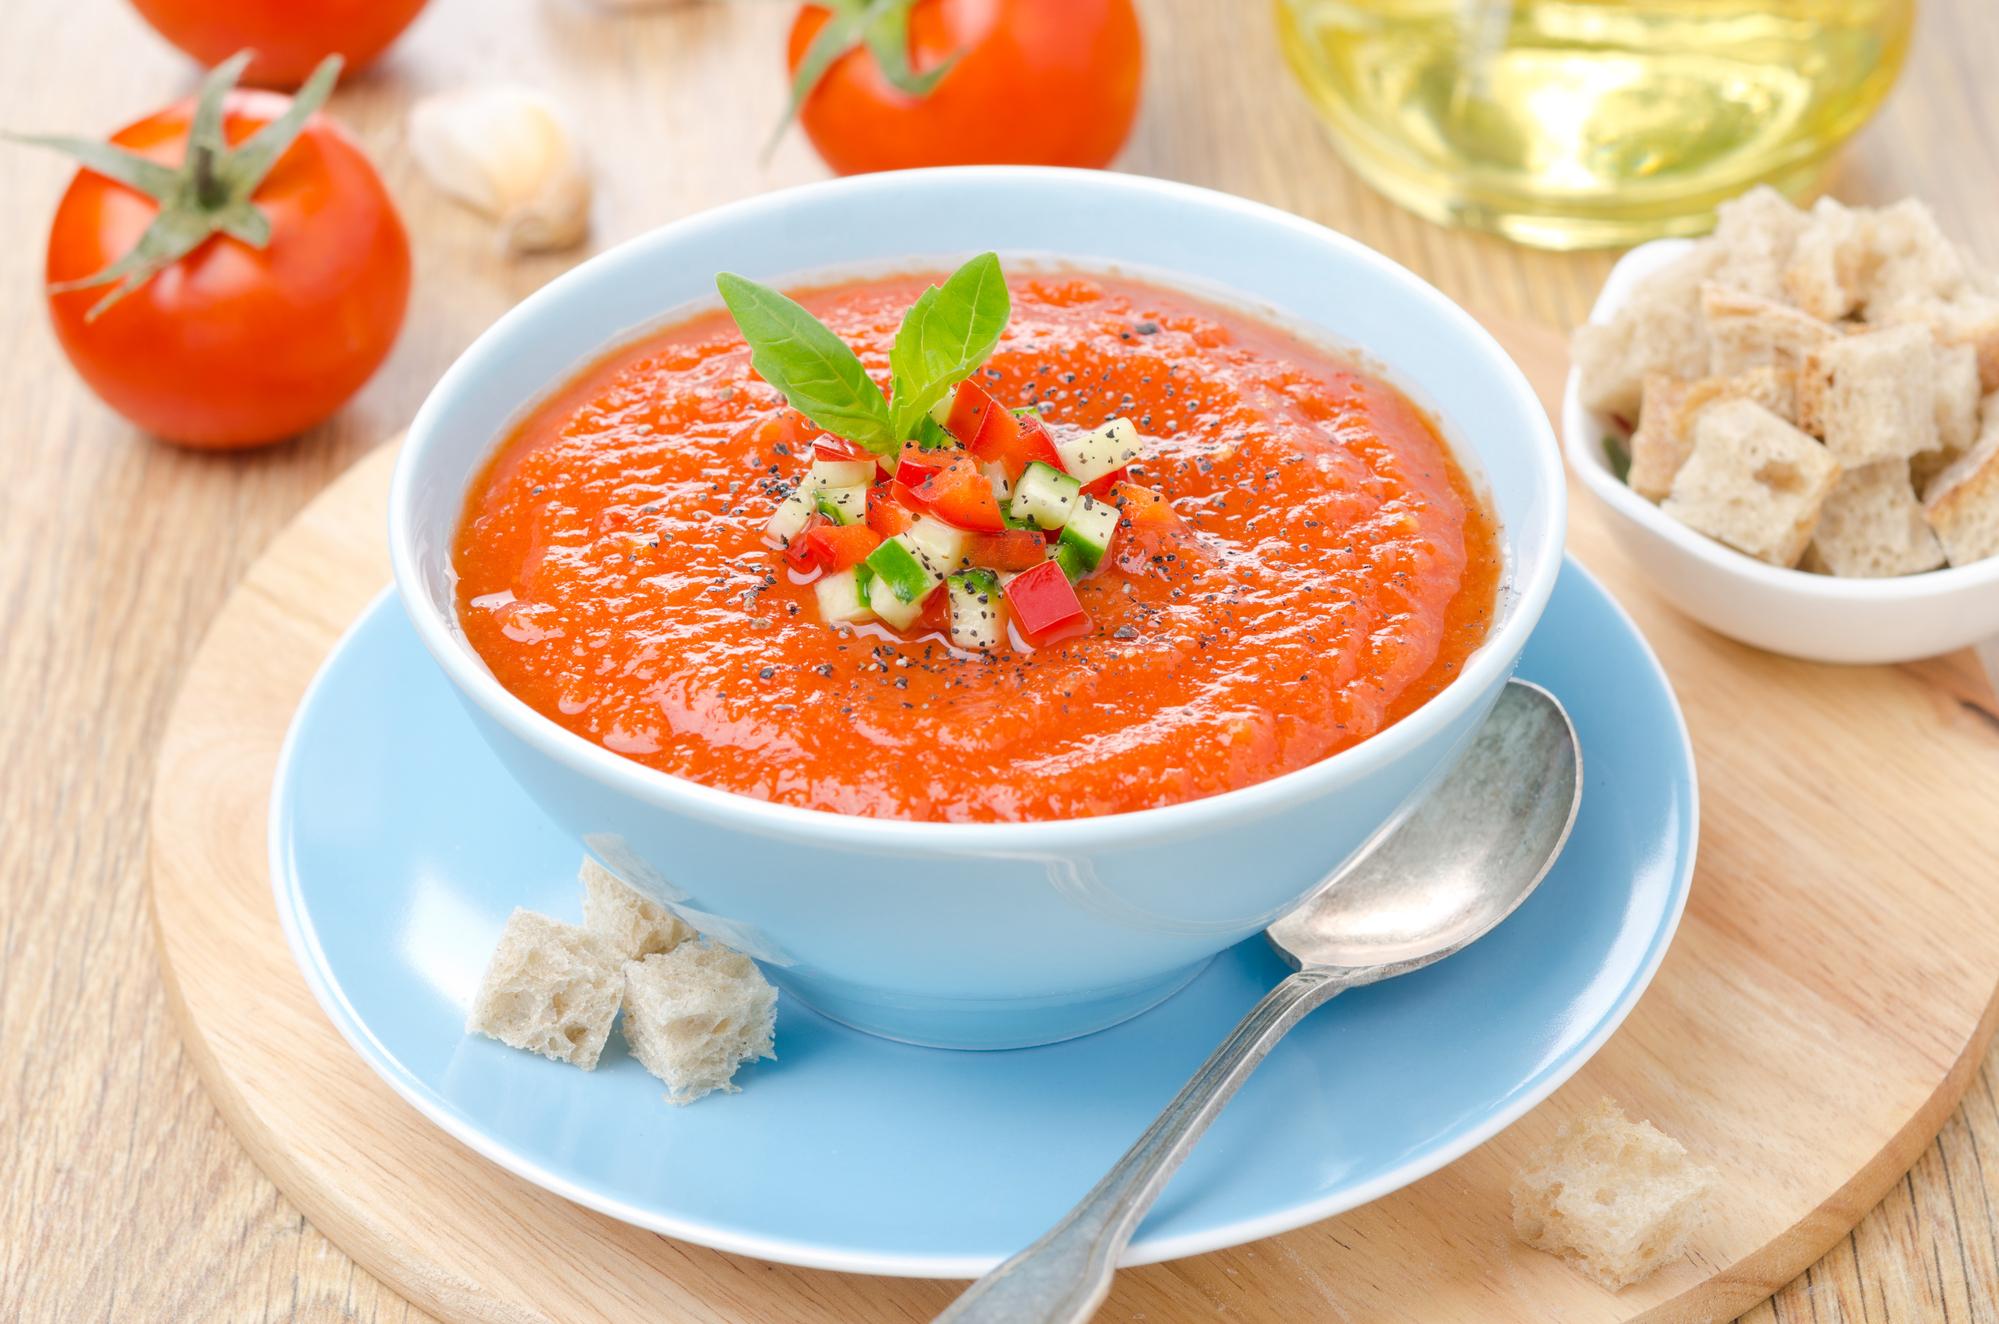 Cold gazpacho soup